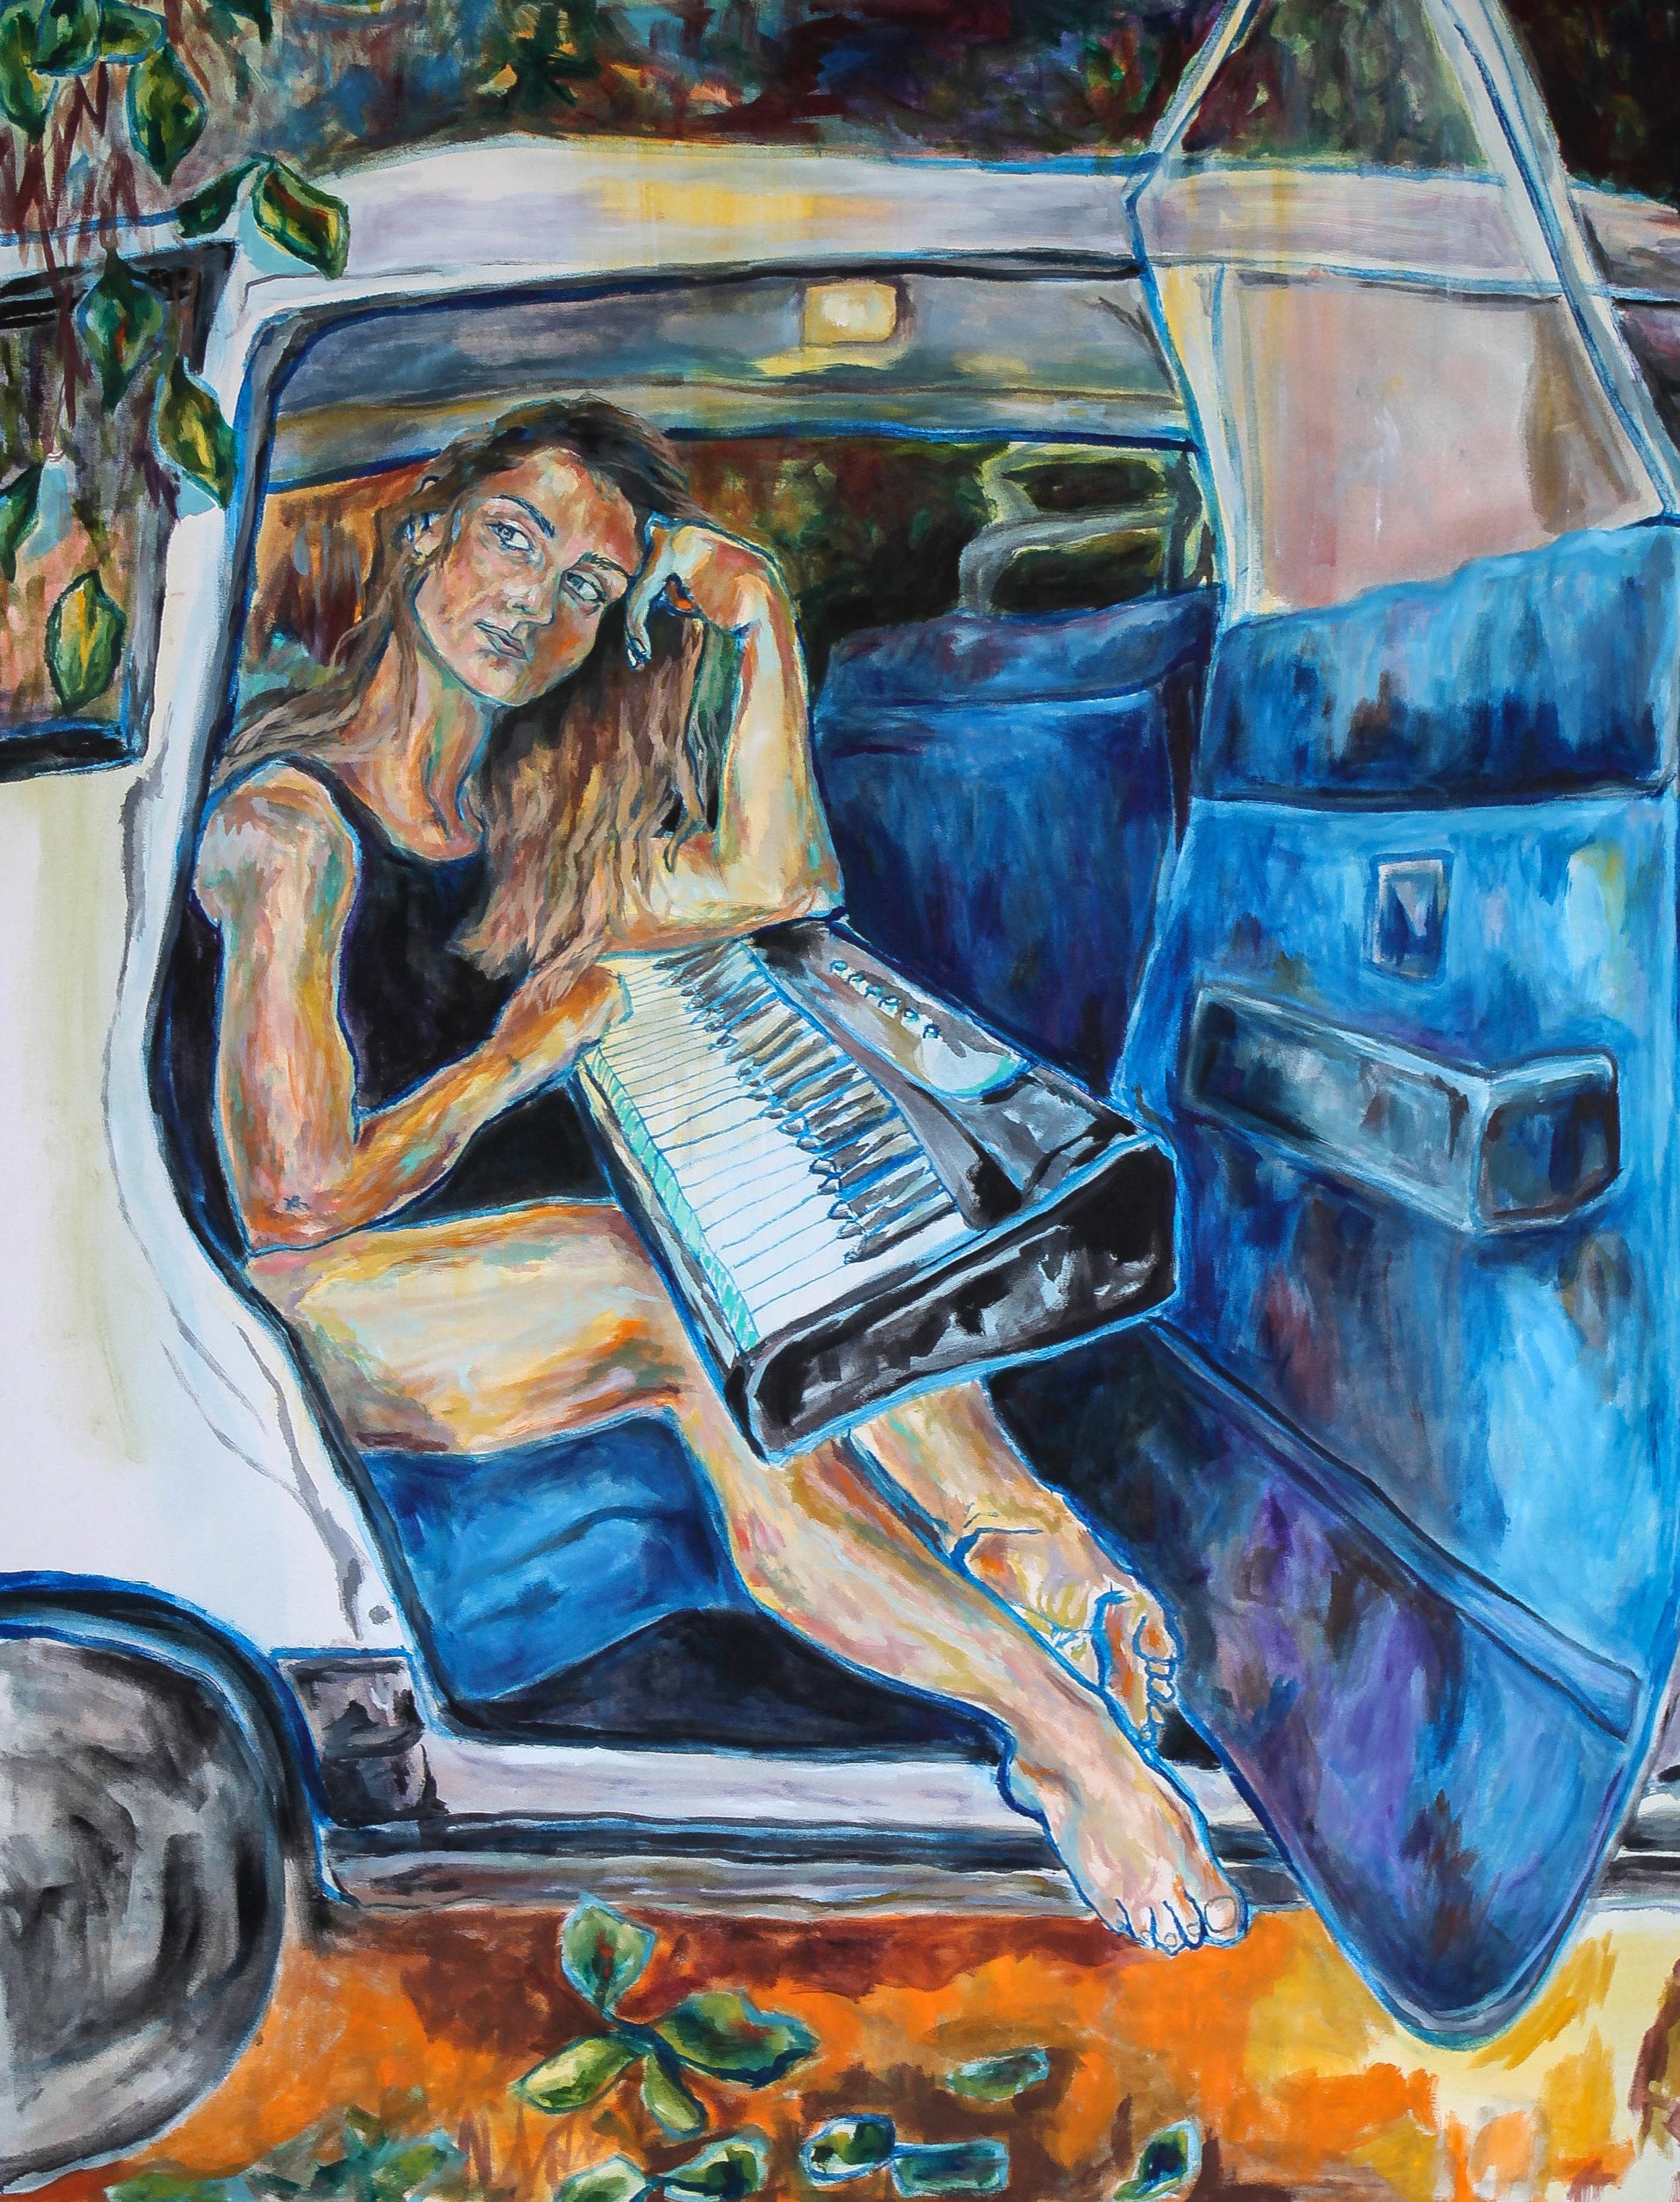 Frankie   4.5 x 4 ft  oil on canvas  *Cover for Frankie's new album, Geniza.  Stream:  https://open.spotify.com/album/4JttoB2t6JmI588XnRmV4d?si=Spkua0k6T6SZDasx2GaABA